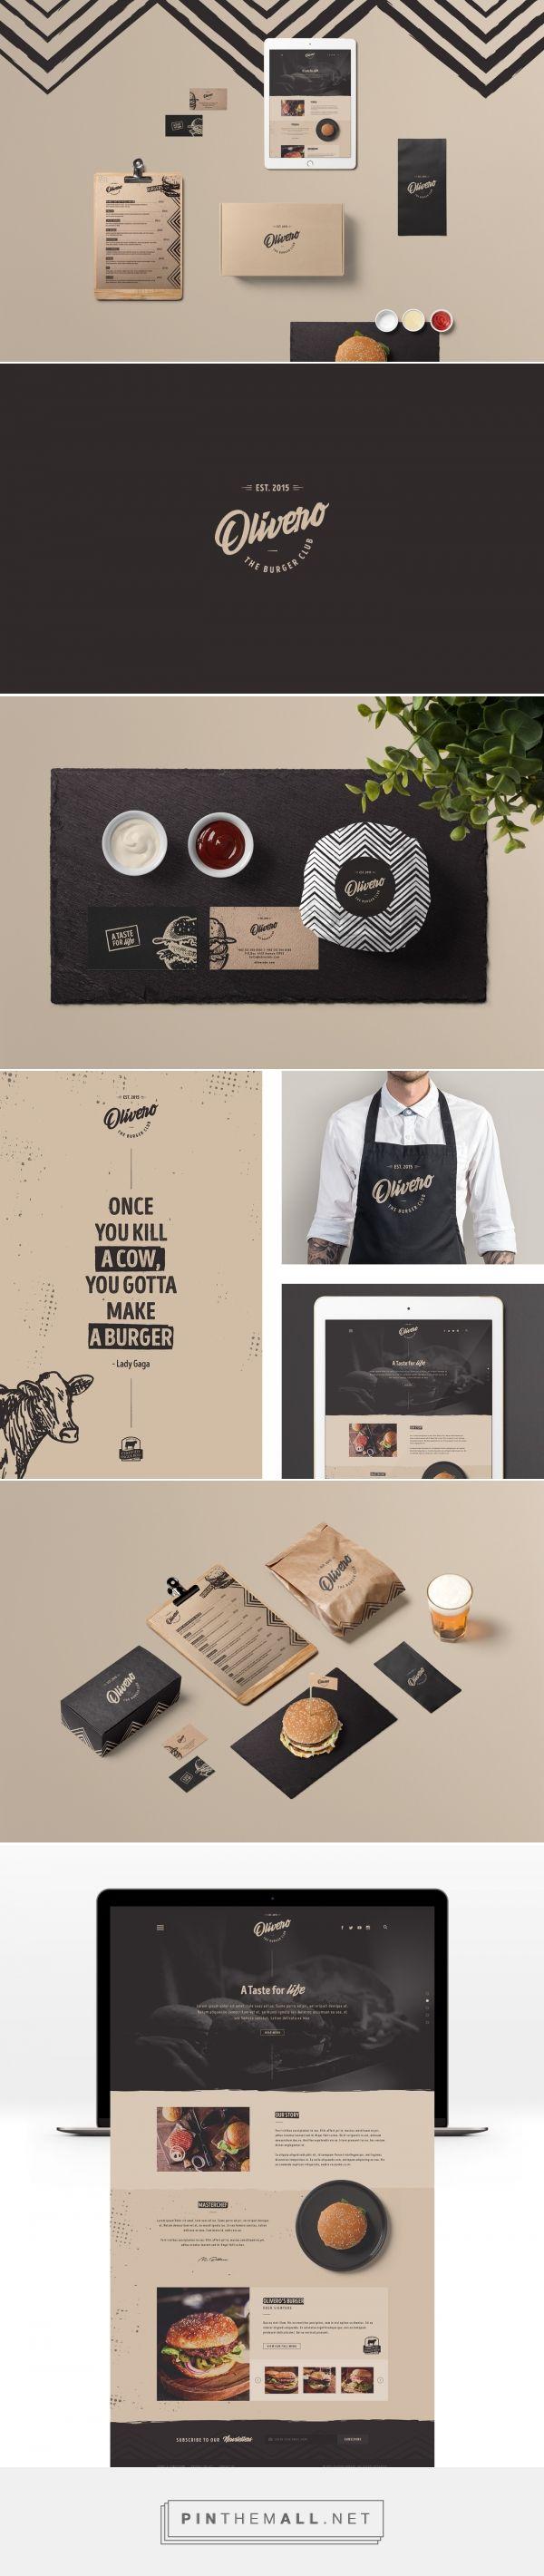 Olivero Burger Club Restaurant Branding and Menu Design by Anas A'abed | Fivestar Branding Agency – Design and Branding Agency & Curated Inspiration Gallery